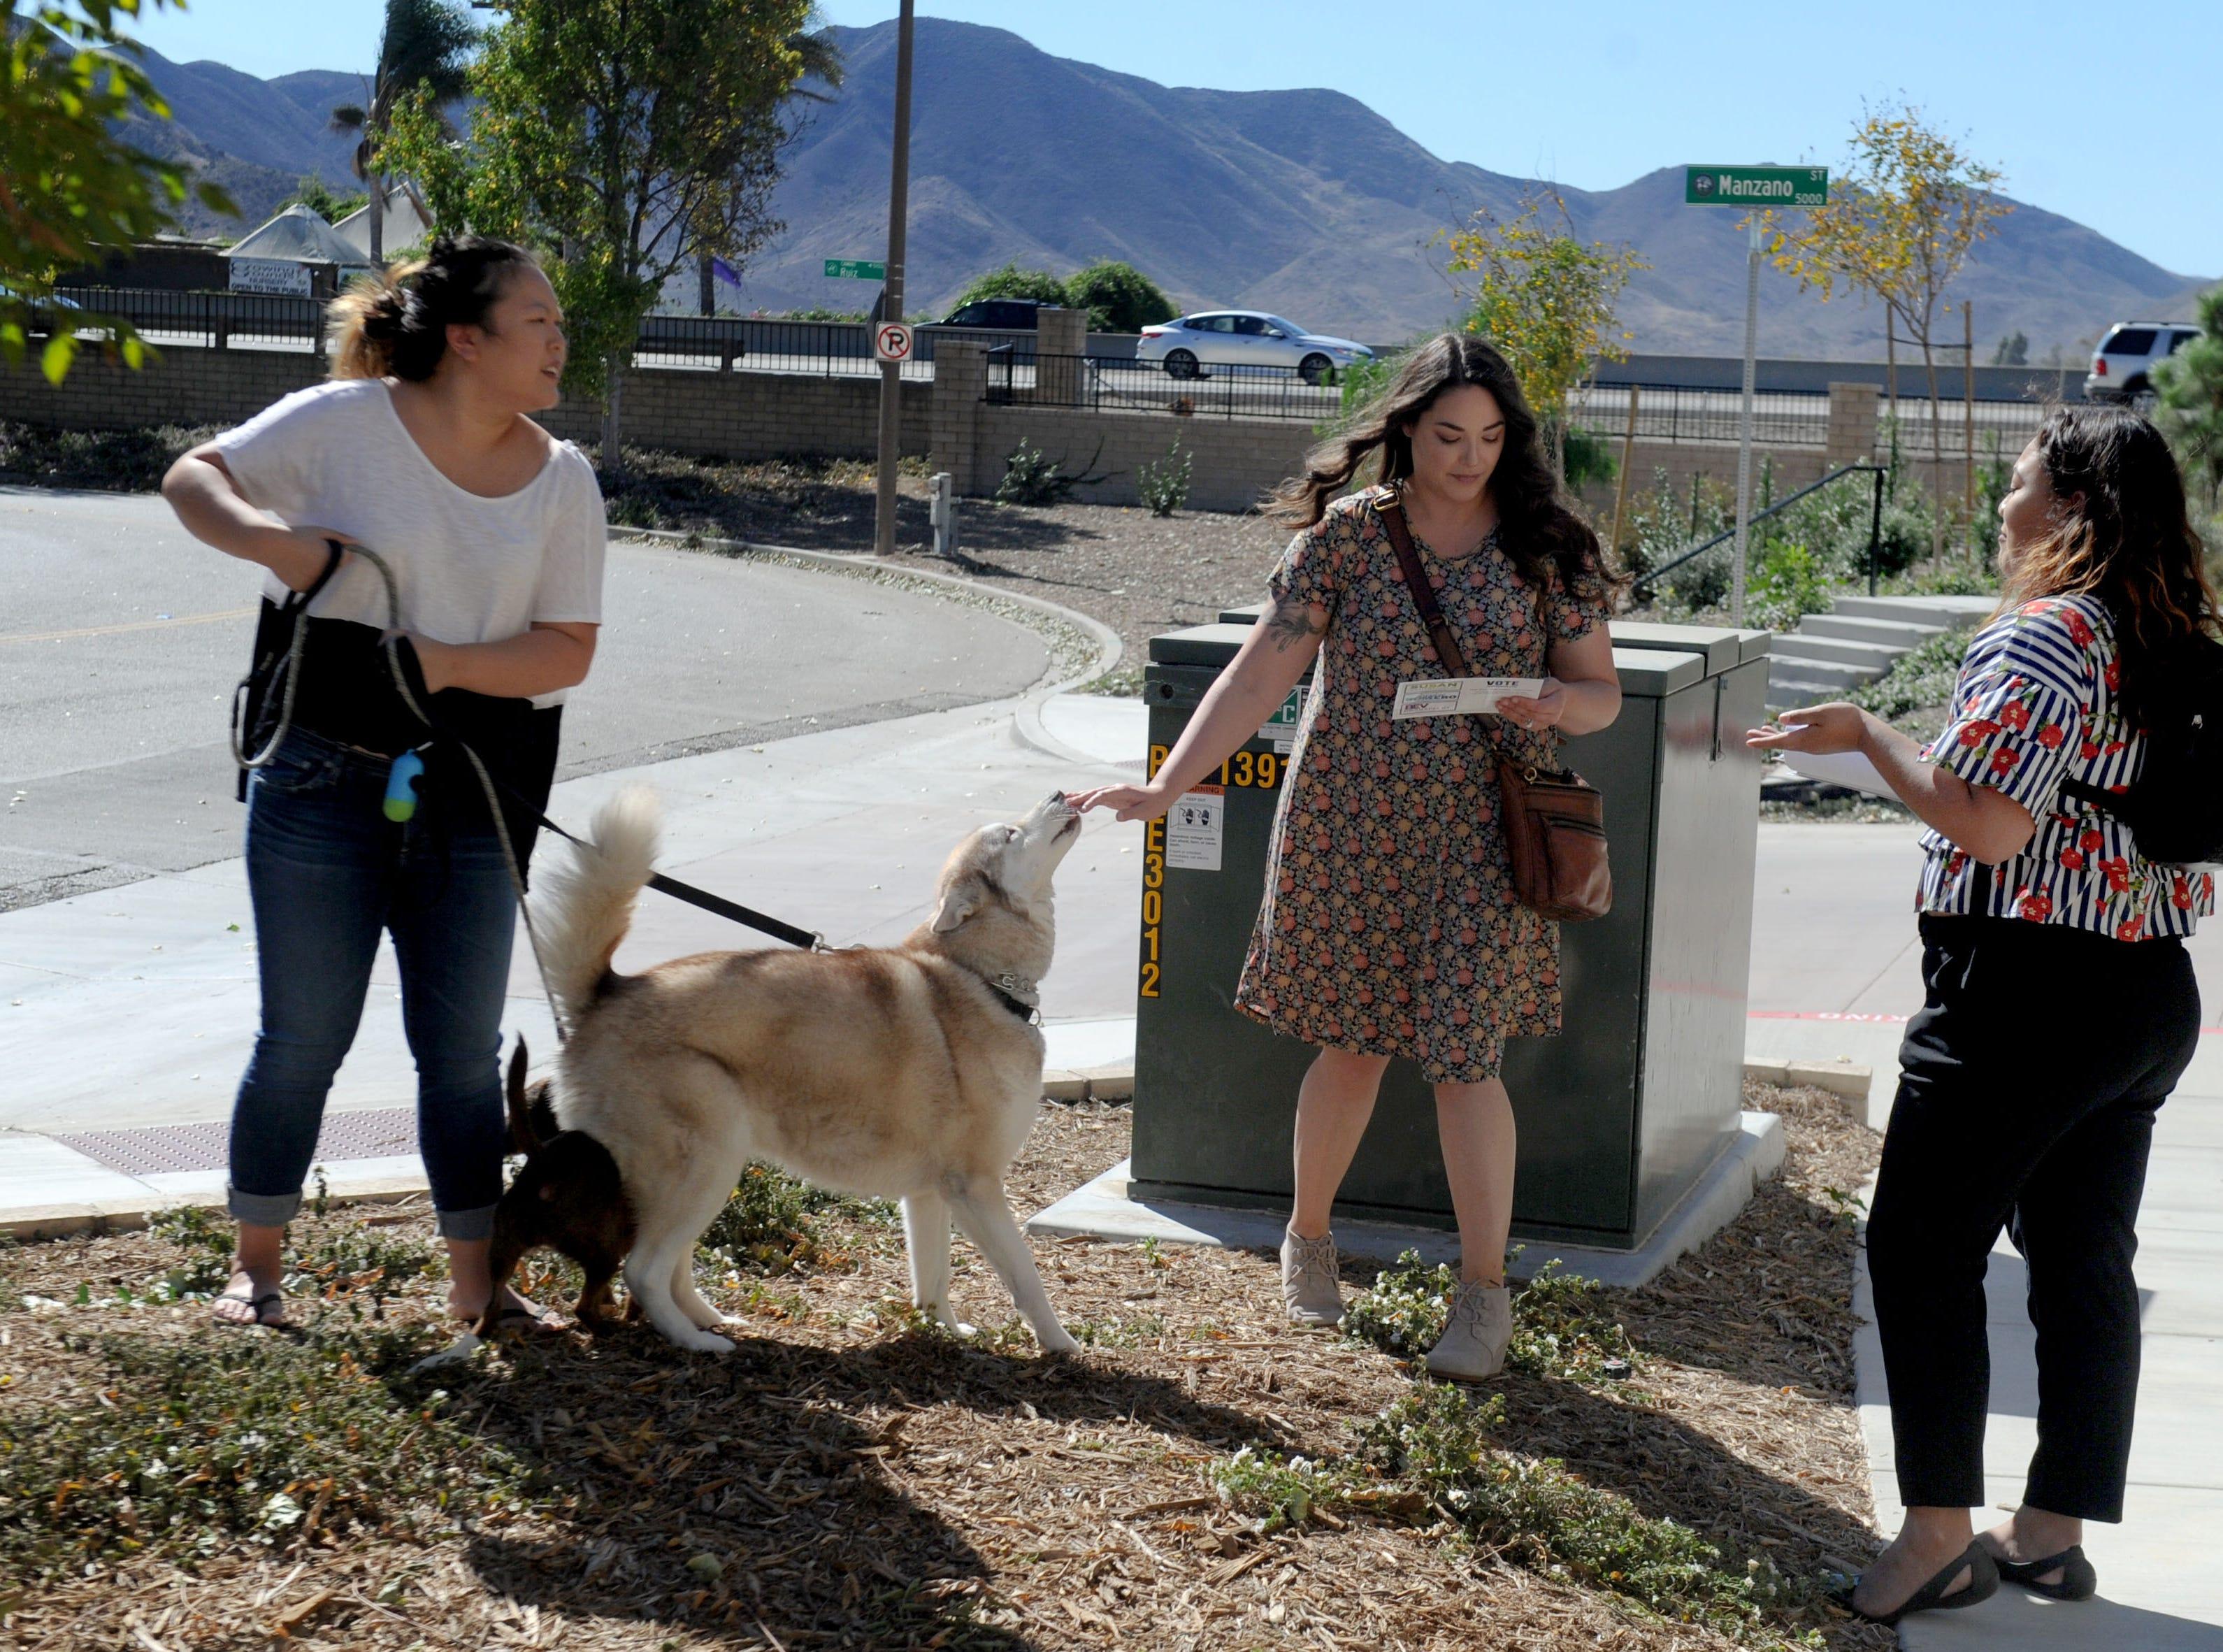 Linda Chun, left, and Stephanie Isomura talk with Jessica Romero in Camarillo.  Romero, Bev Dransfeldt and Susan Santangelo decided to run as a ticket for Camarillo City Council.